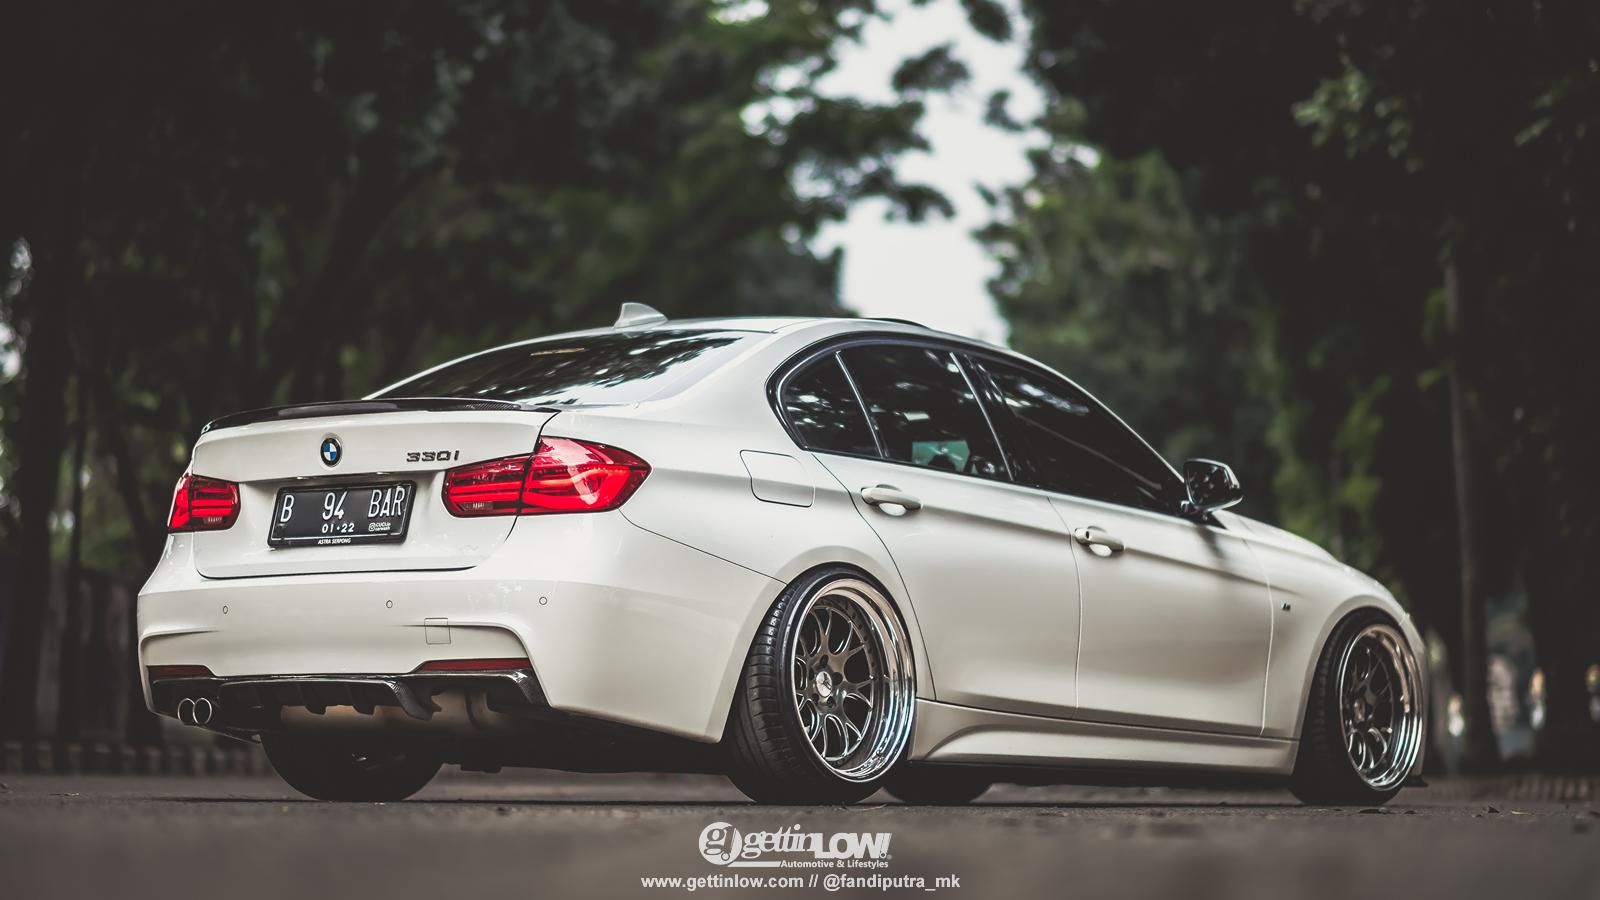 akbar dayuh 2017 BMW F30-330iMsport